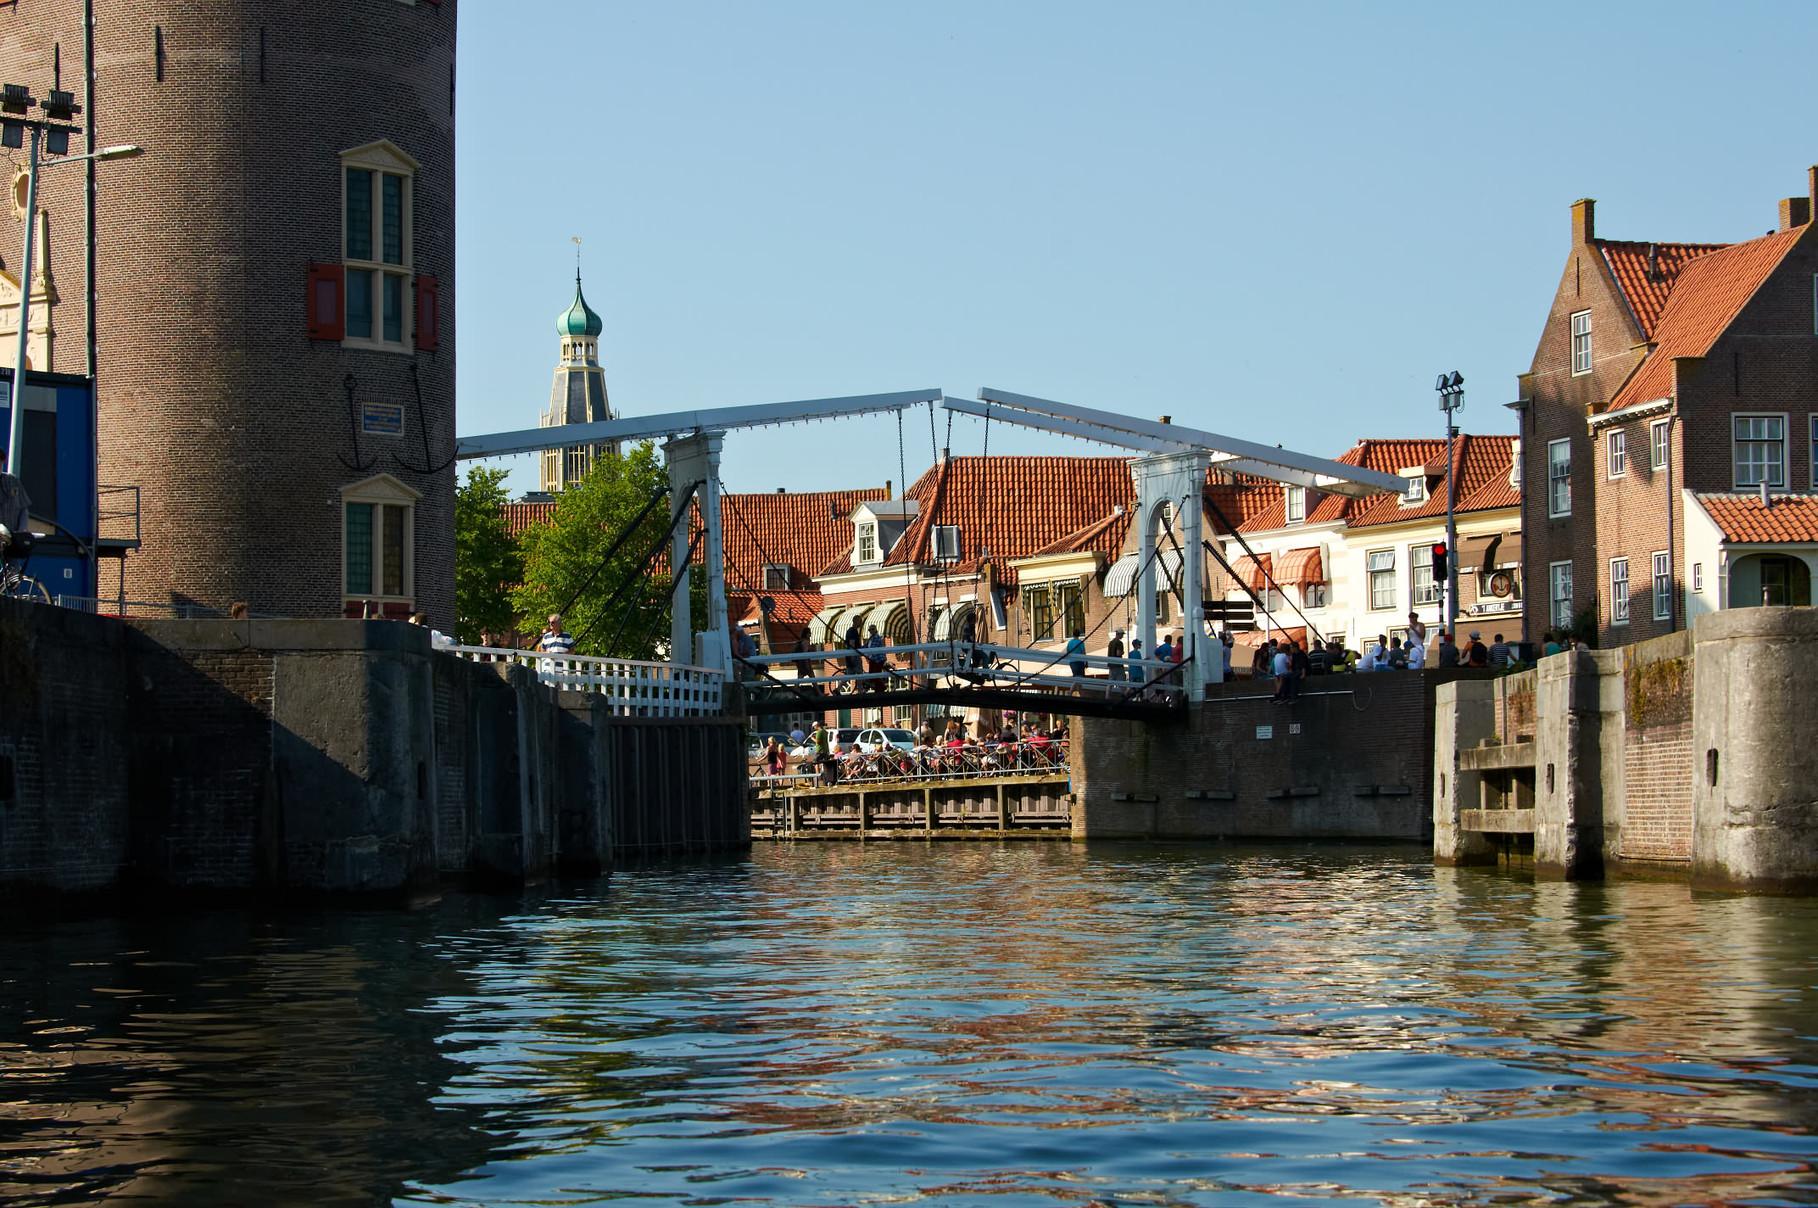 Enkhuizen, Ijsselmeer, Holland, Wasser, Segeln, Urlaub, Mies Vandenbergh Fotografie